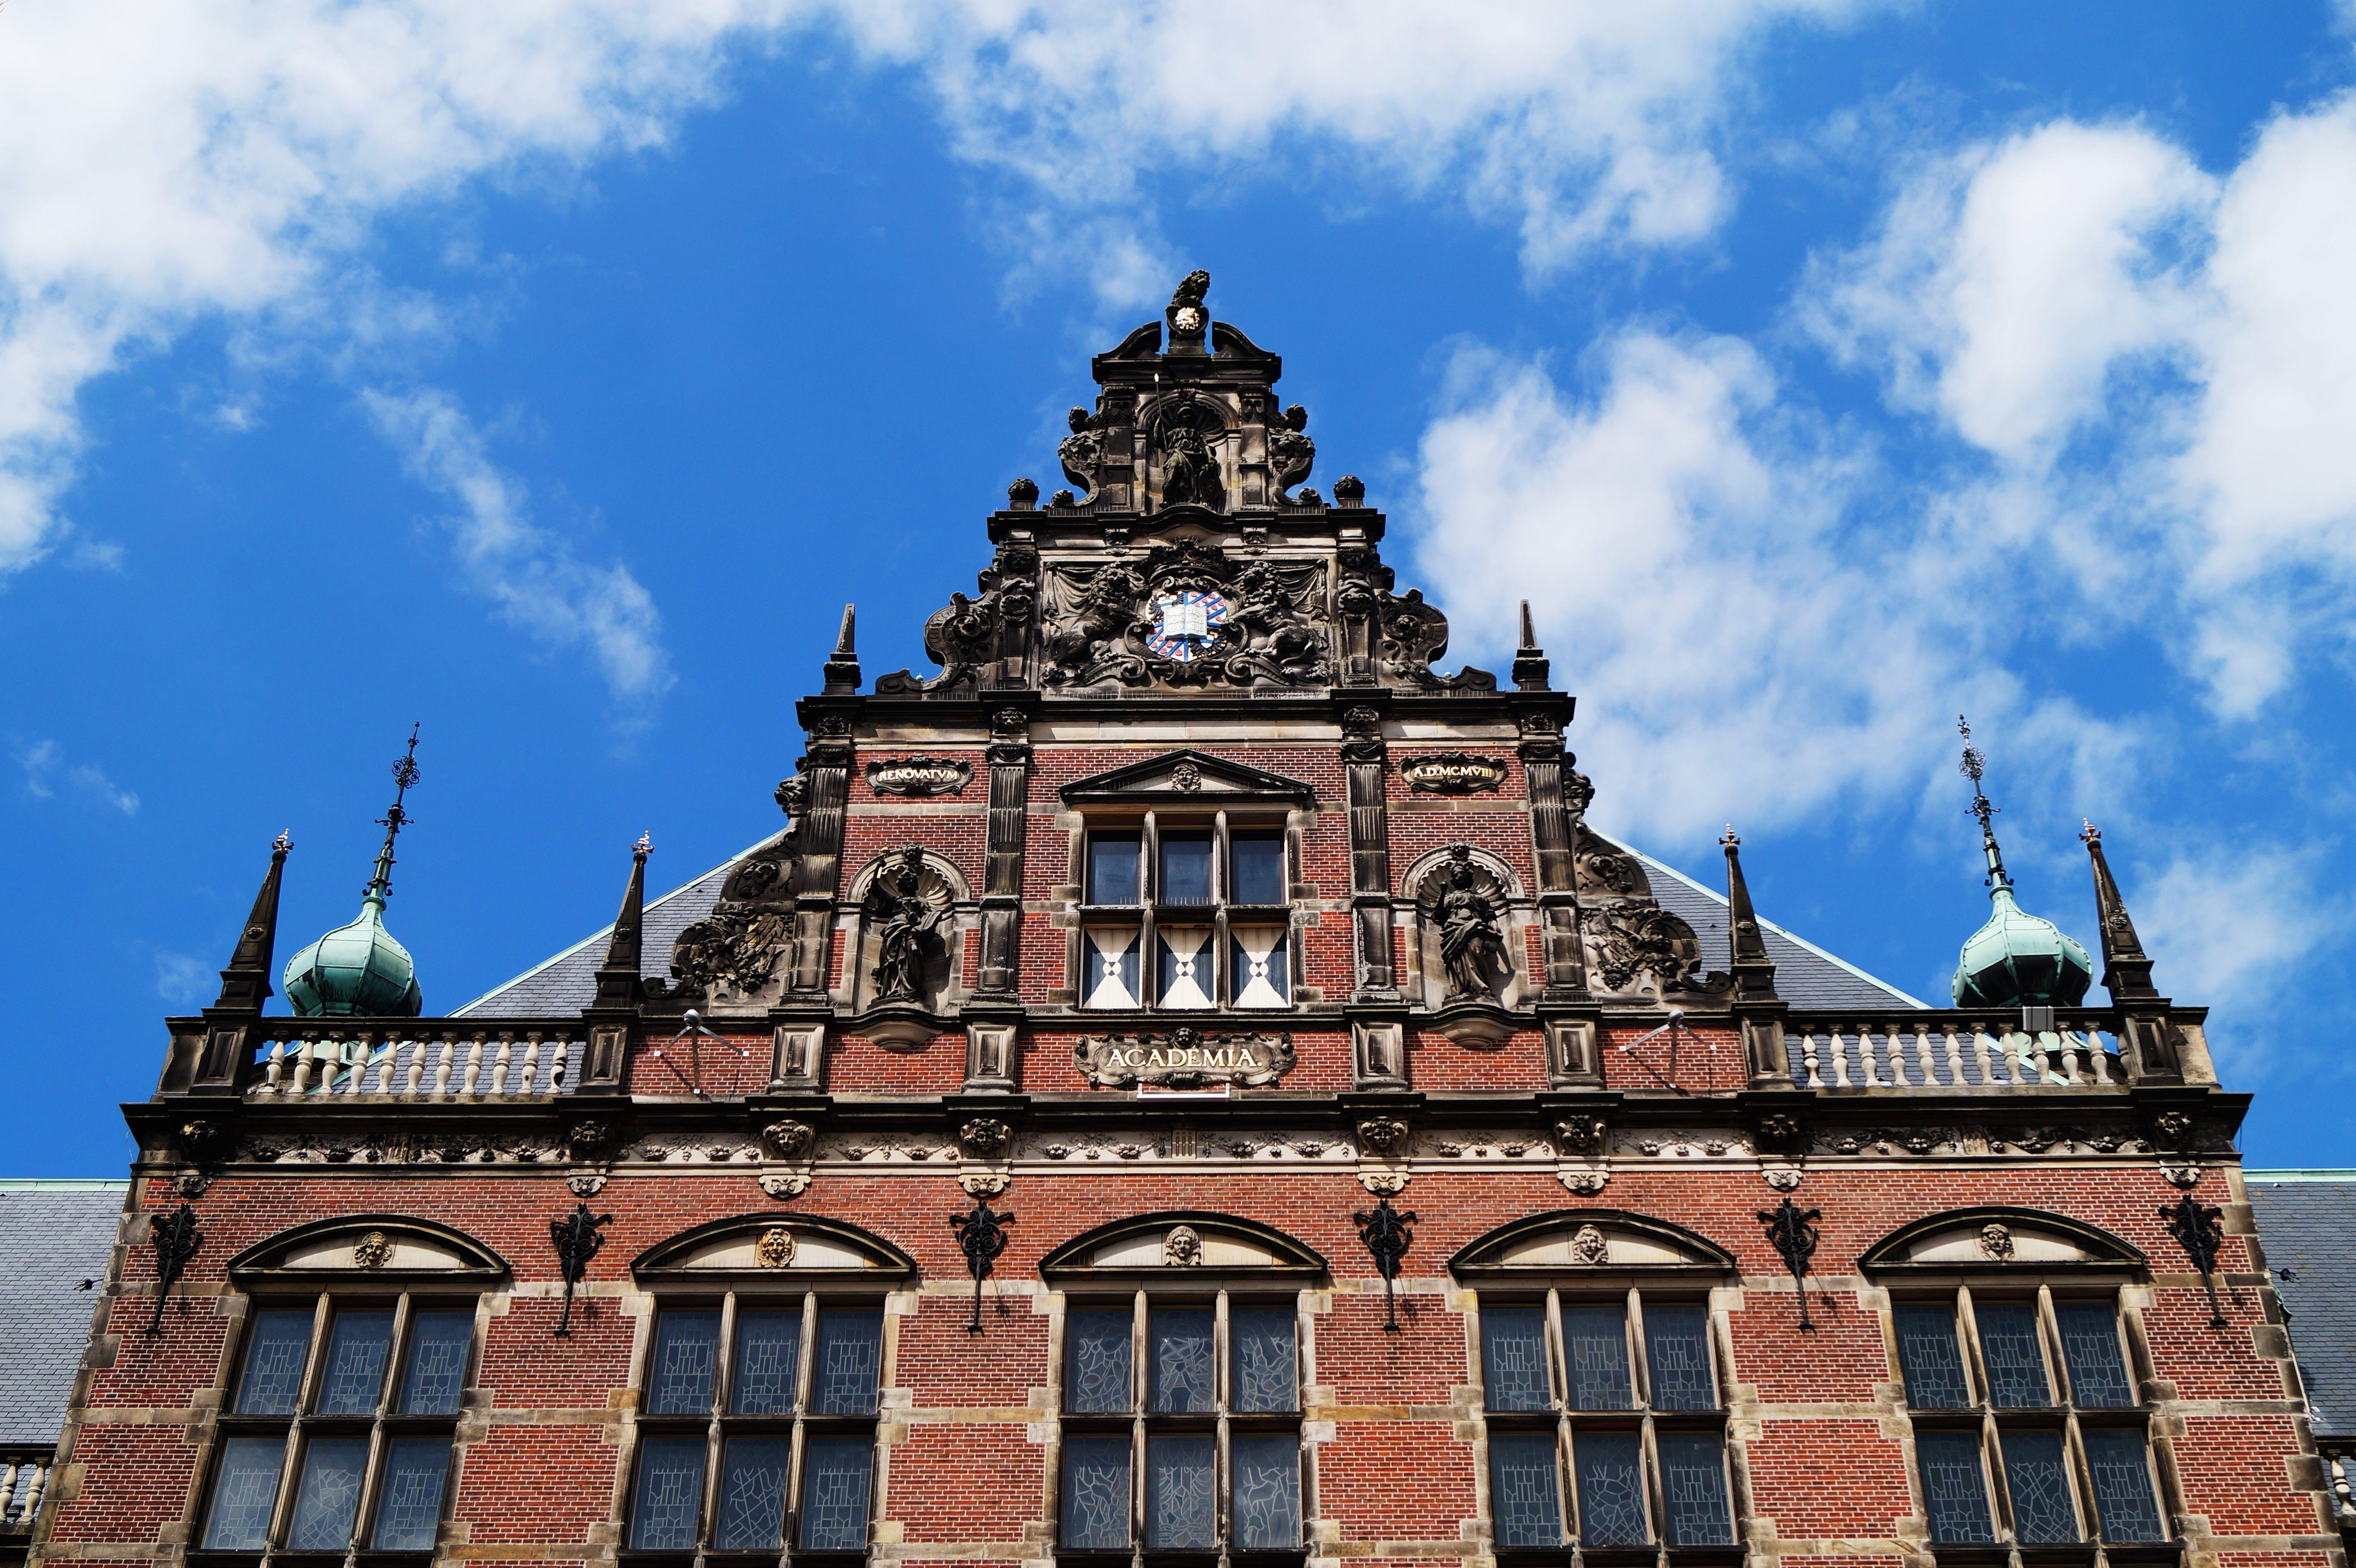 architecture, art, blue sky